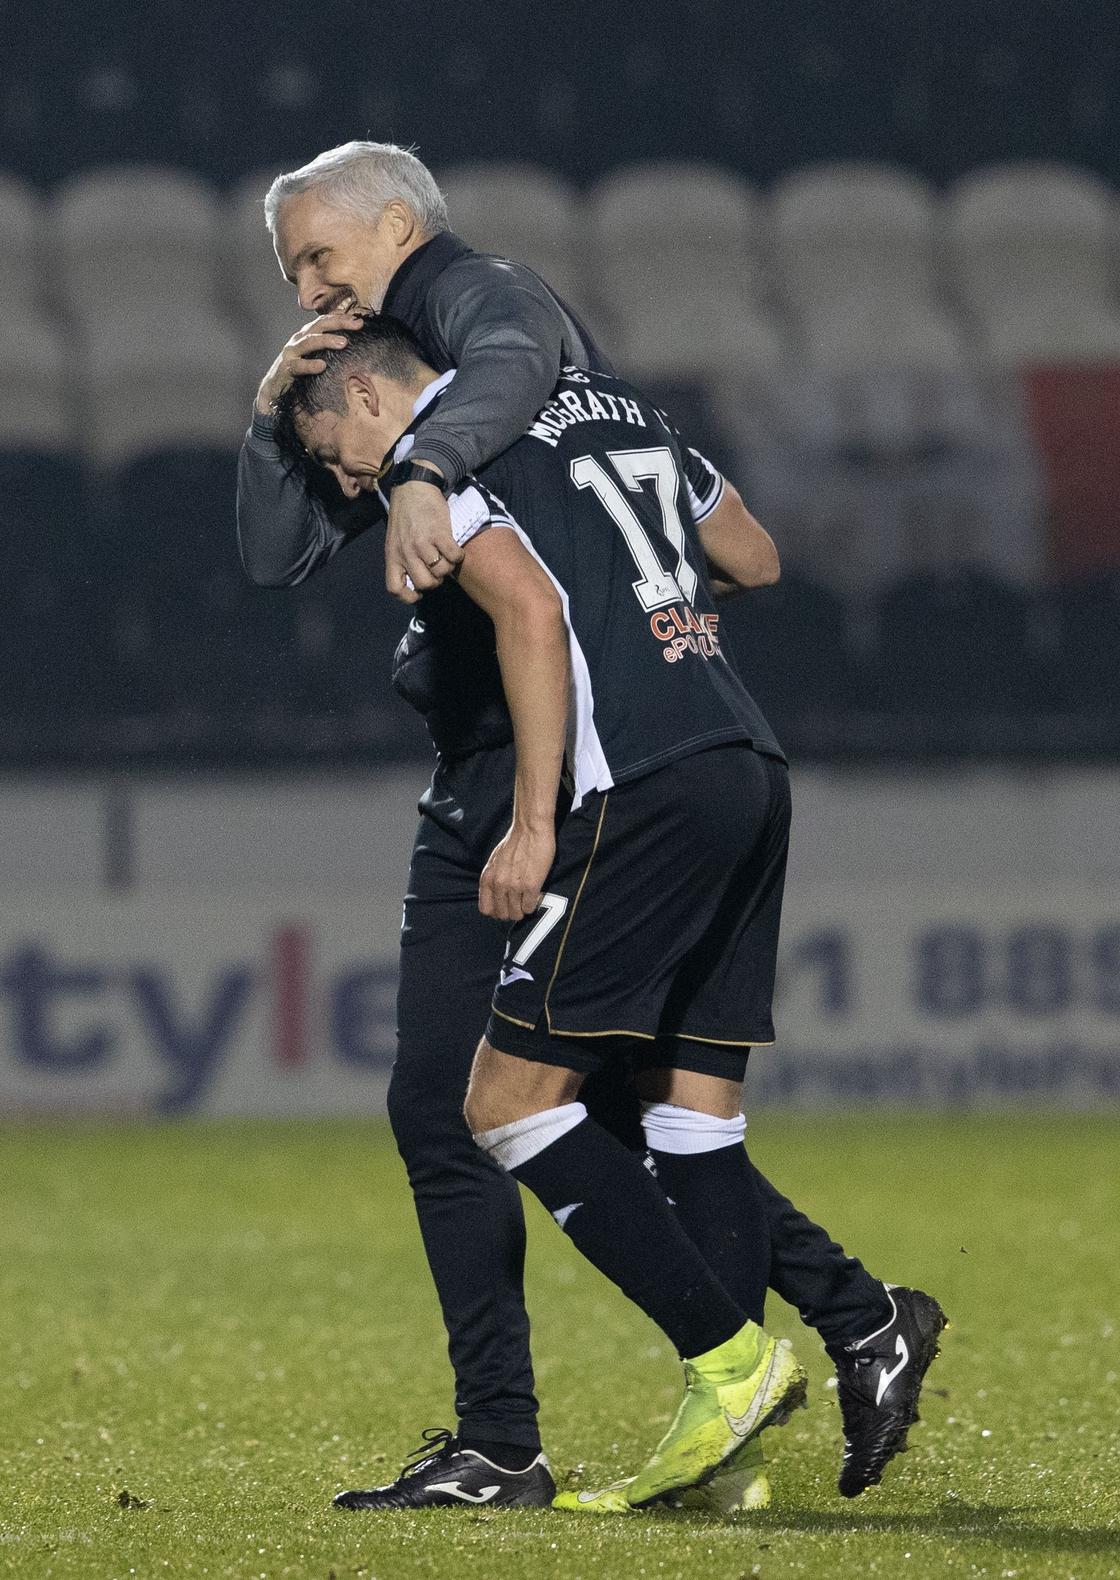 Image - Goodwin (L) congratulates Jamie McGrath after a match last November